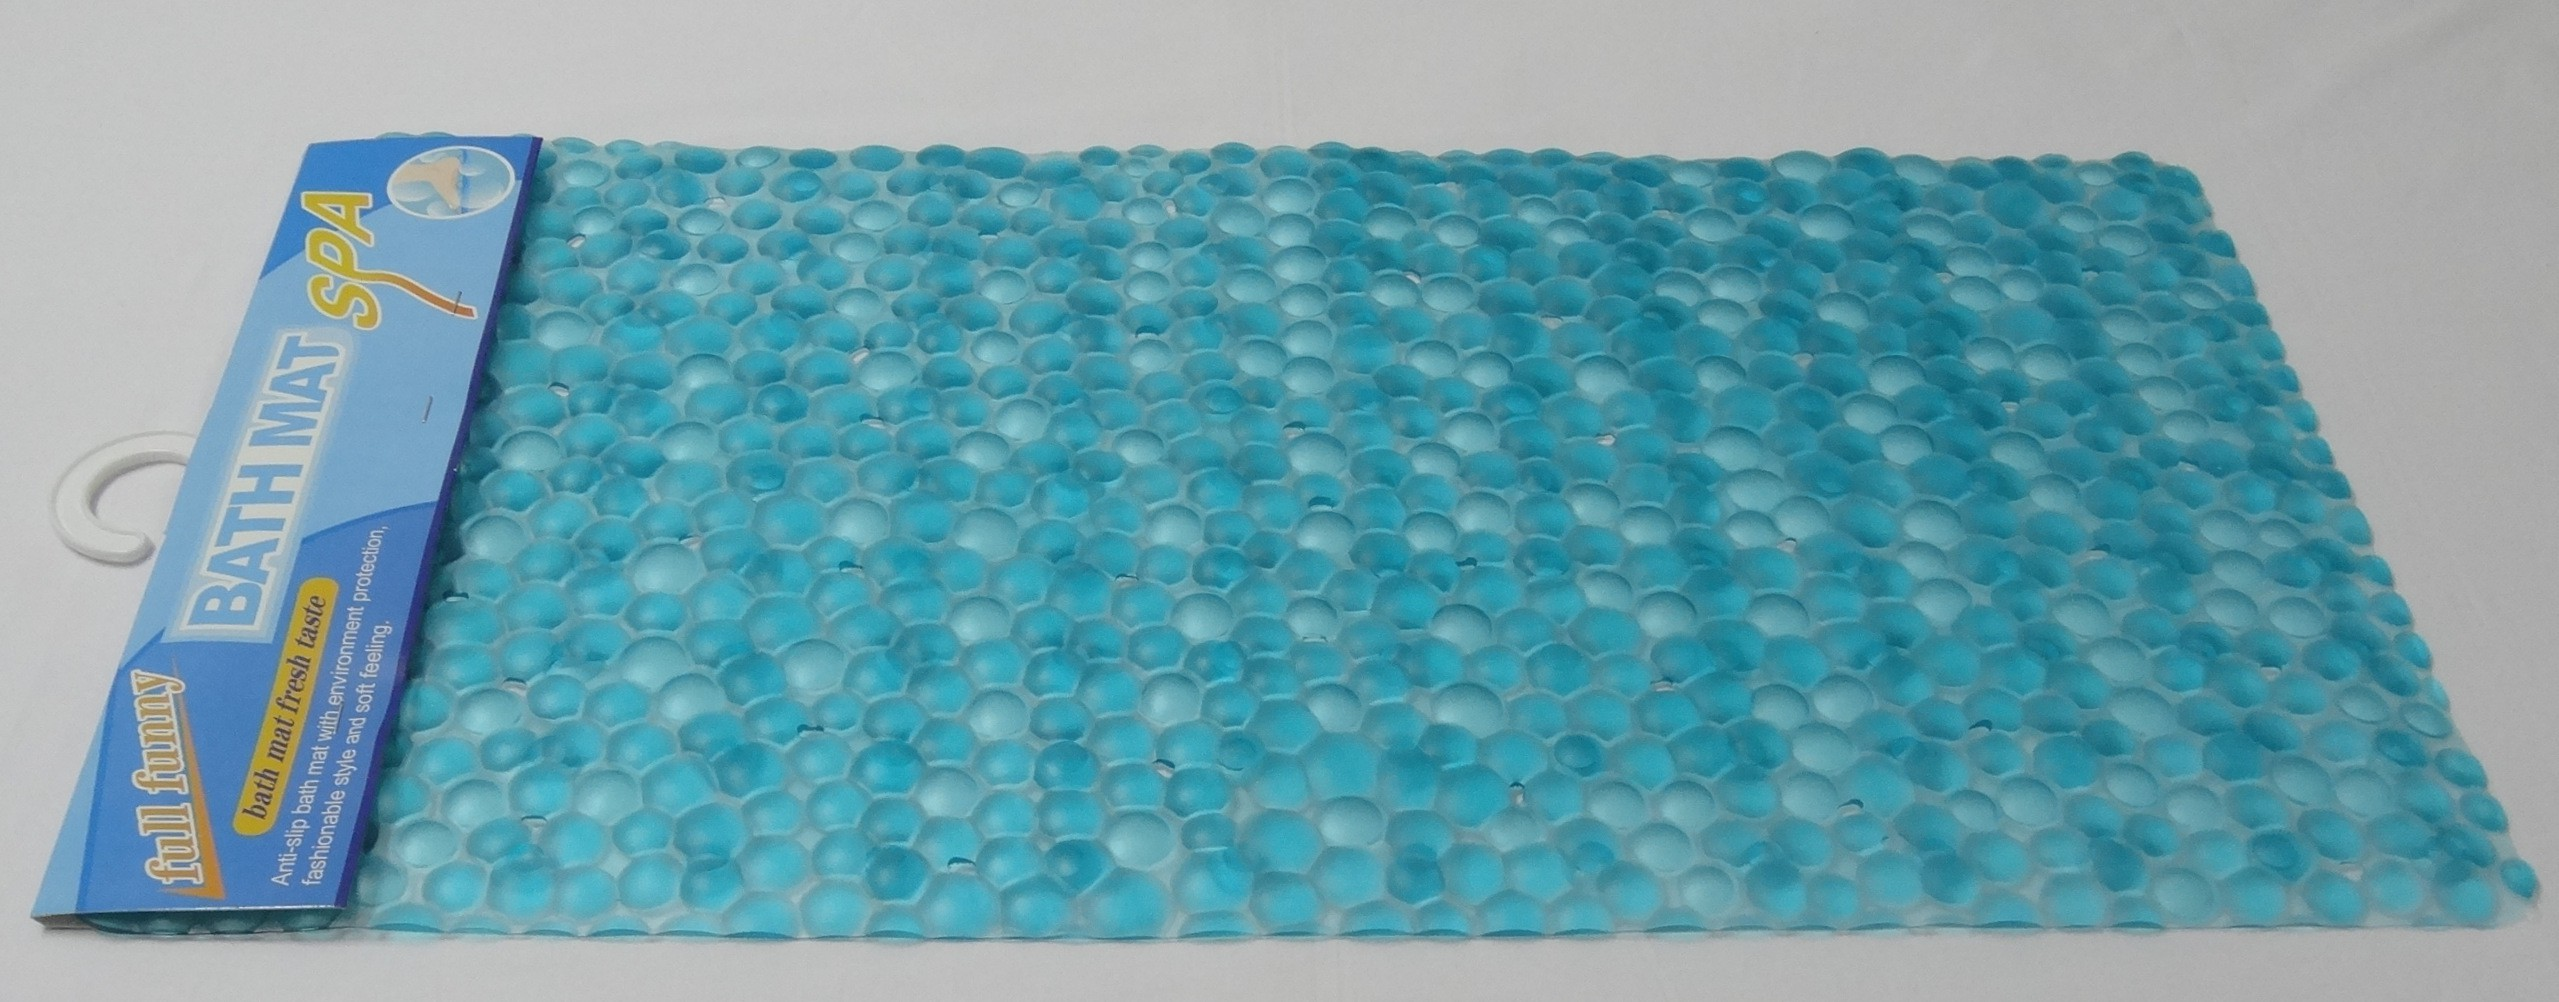 Decorika PVC Medium Bath Mat Bath Mat